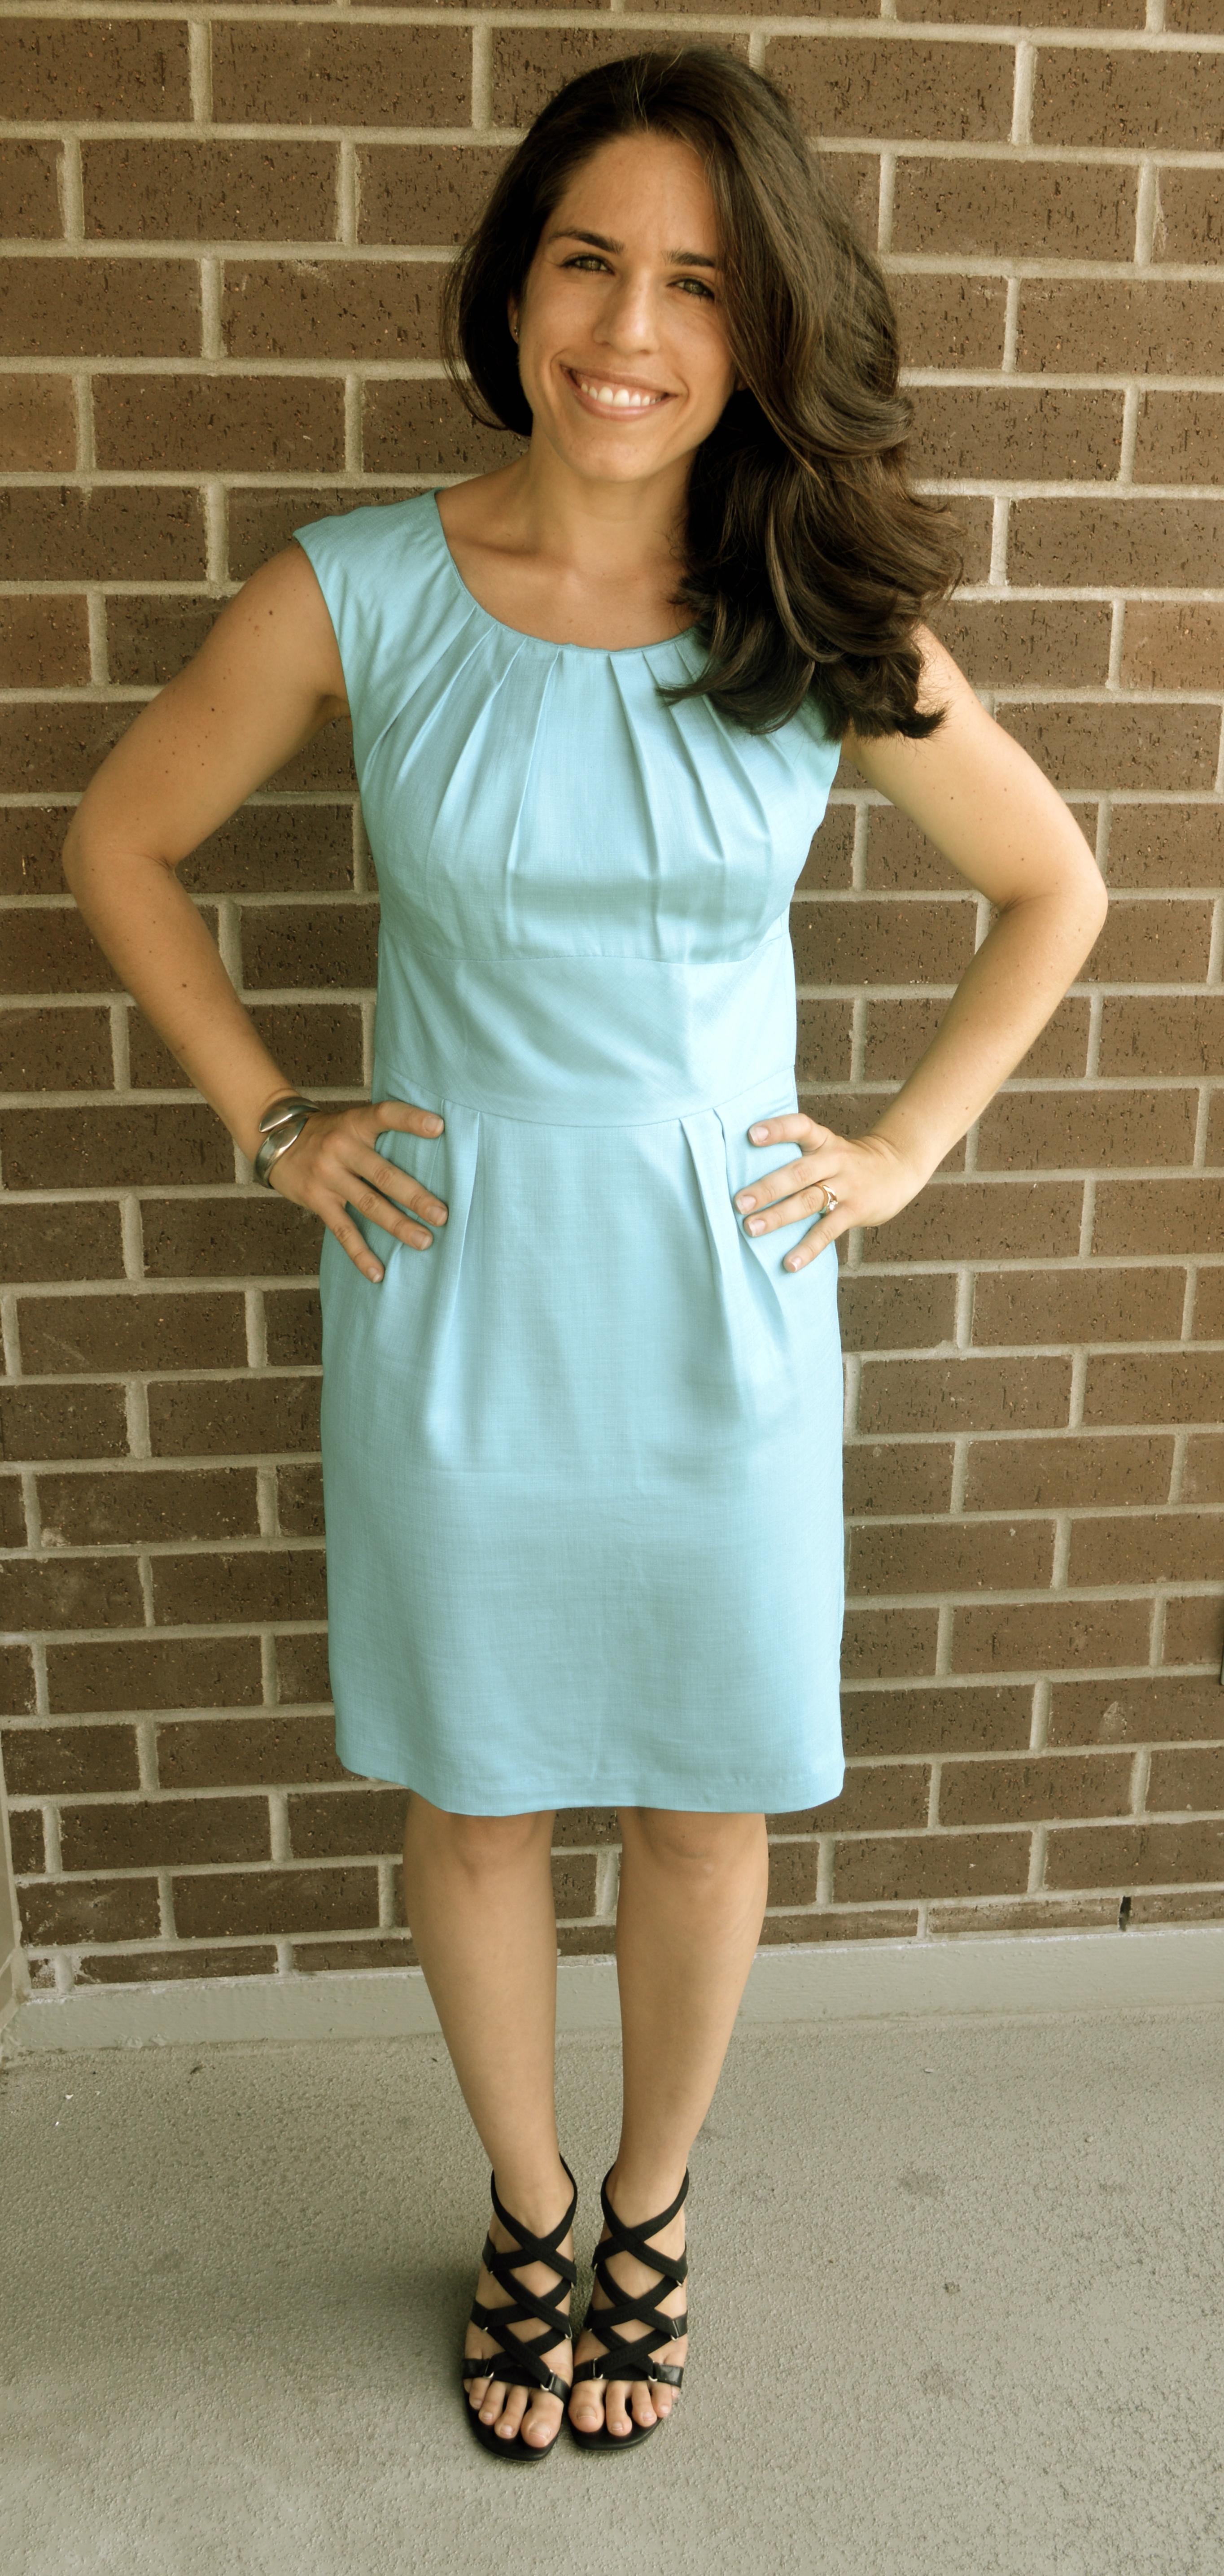 Dress | Wardrobe Vibrancy